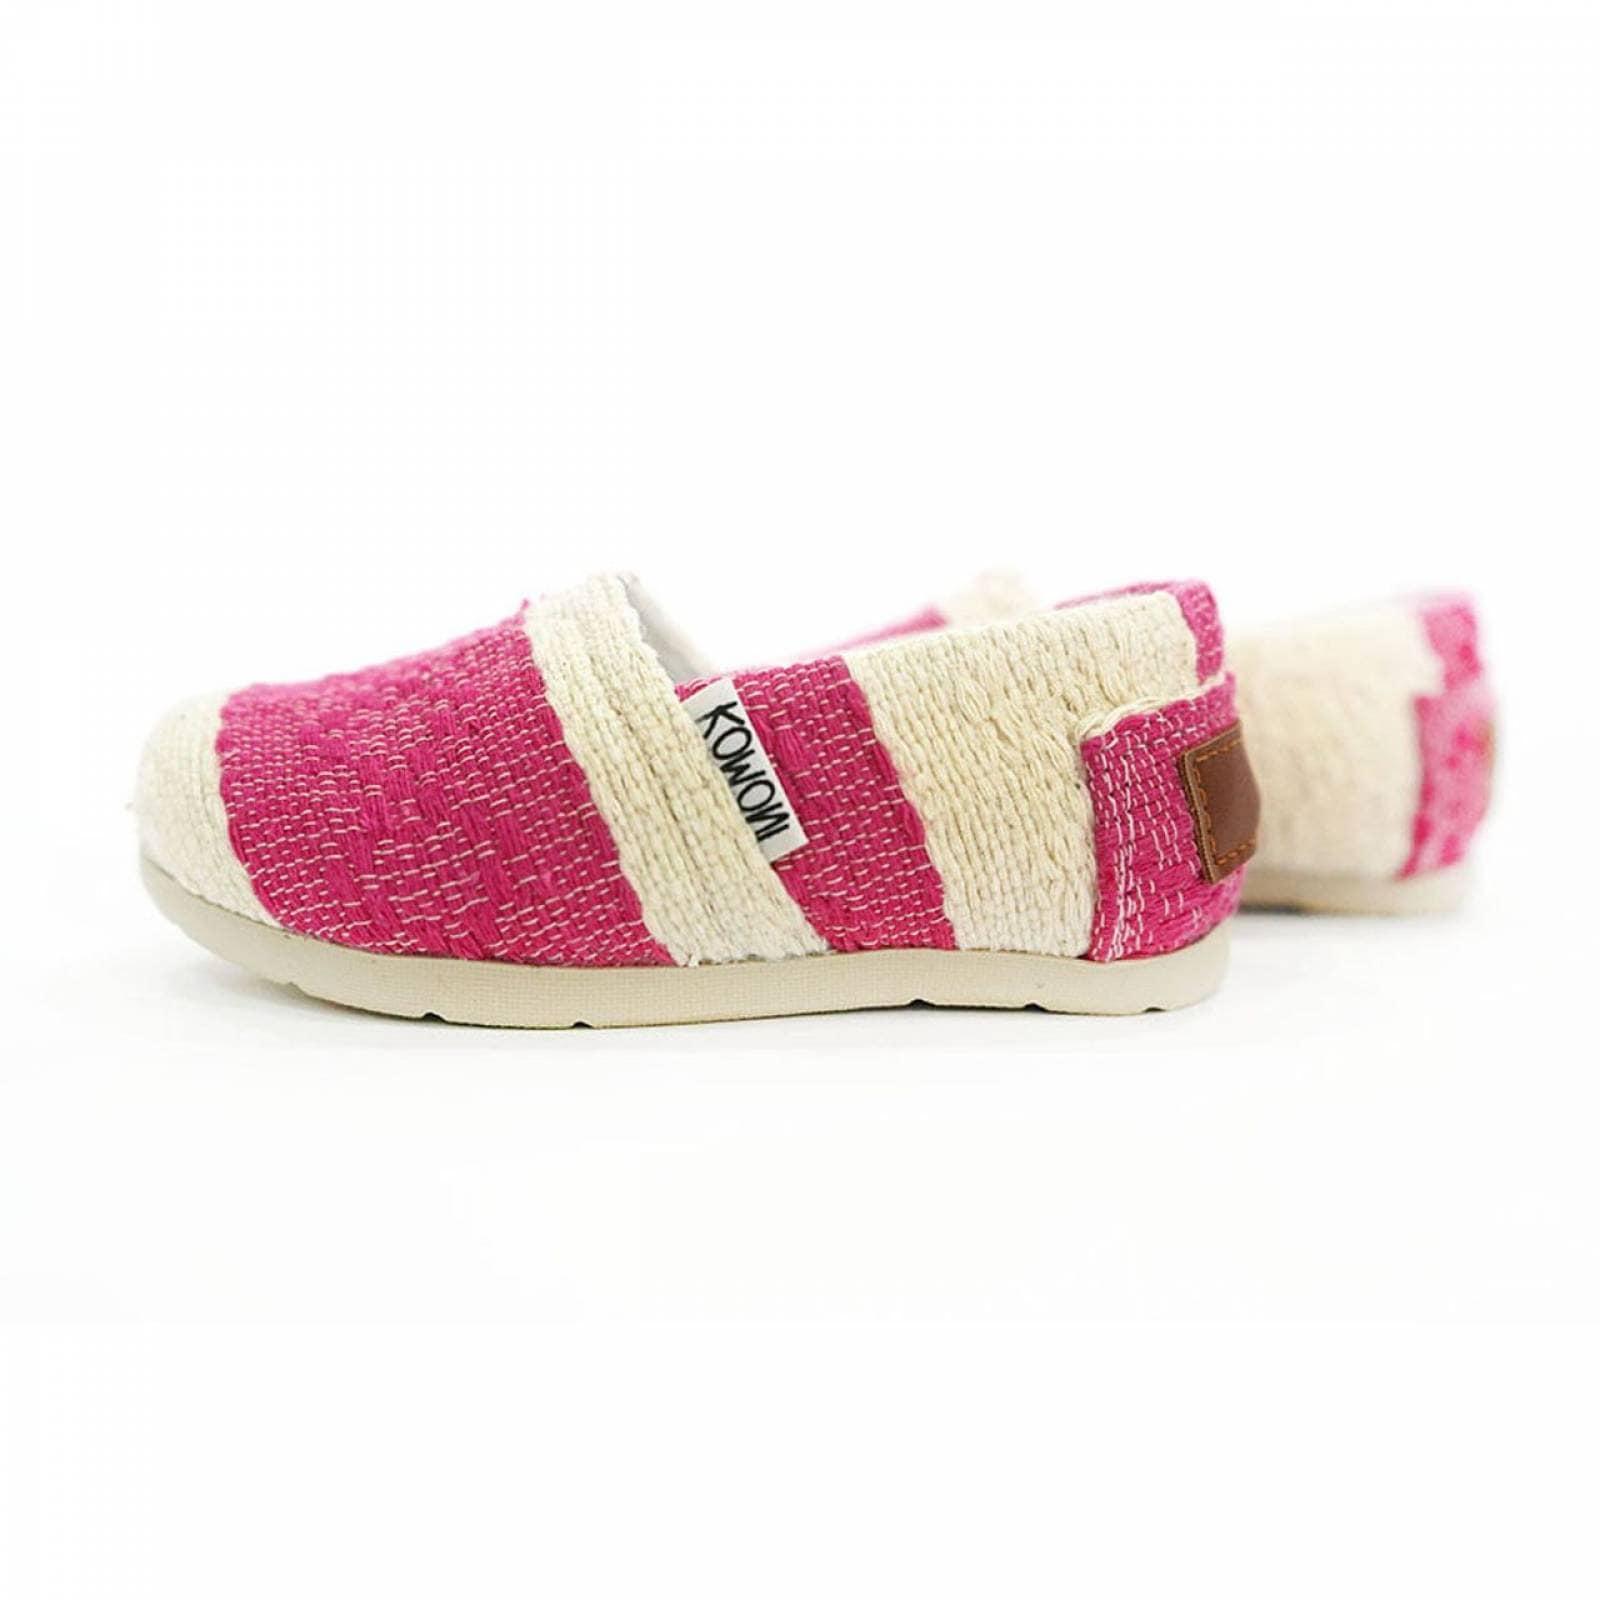 Zapato Alpargata Mini Jacinta Artesanal Tela Infantil Rosa Komoni Talla: 15